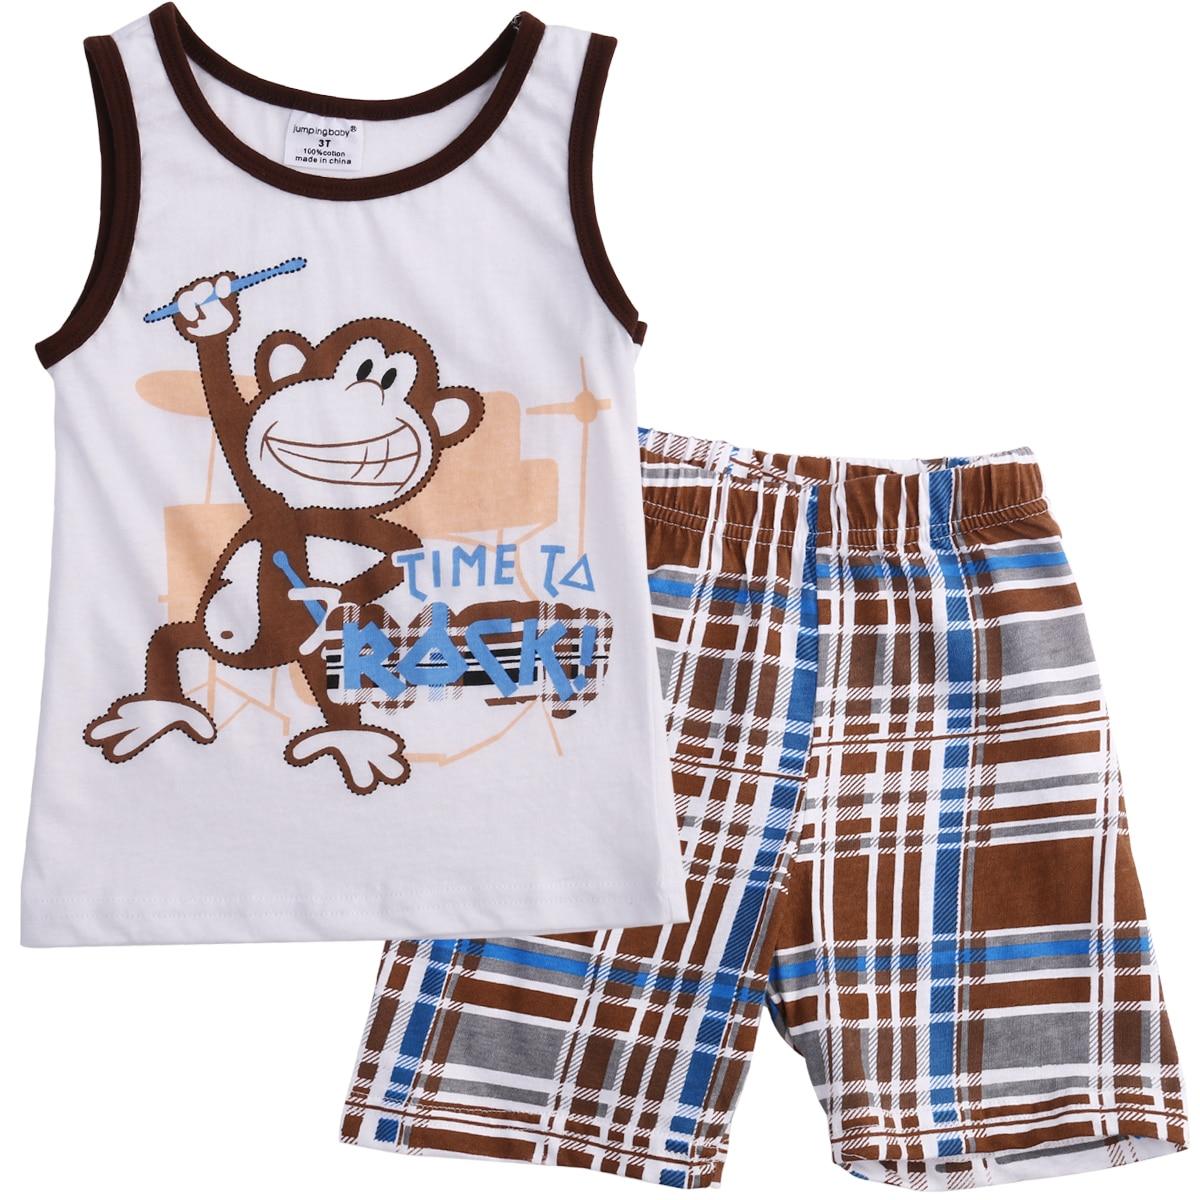 Cartoon Monkey Toddler Kids Baby Boys Summer Outfits T-shirt Tank Tops Cartoon Monkey +Pants 2pcs Clothes Set